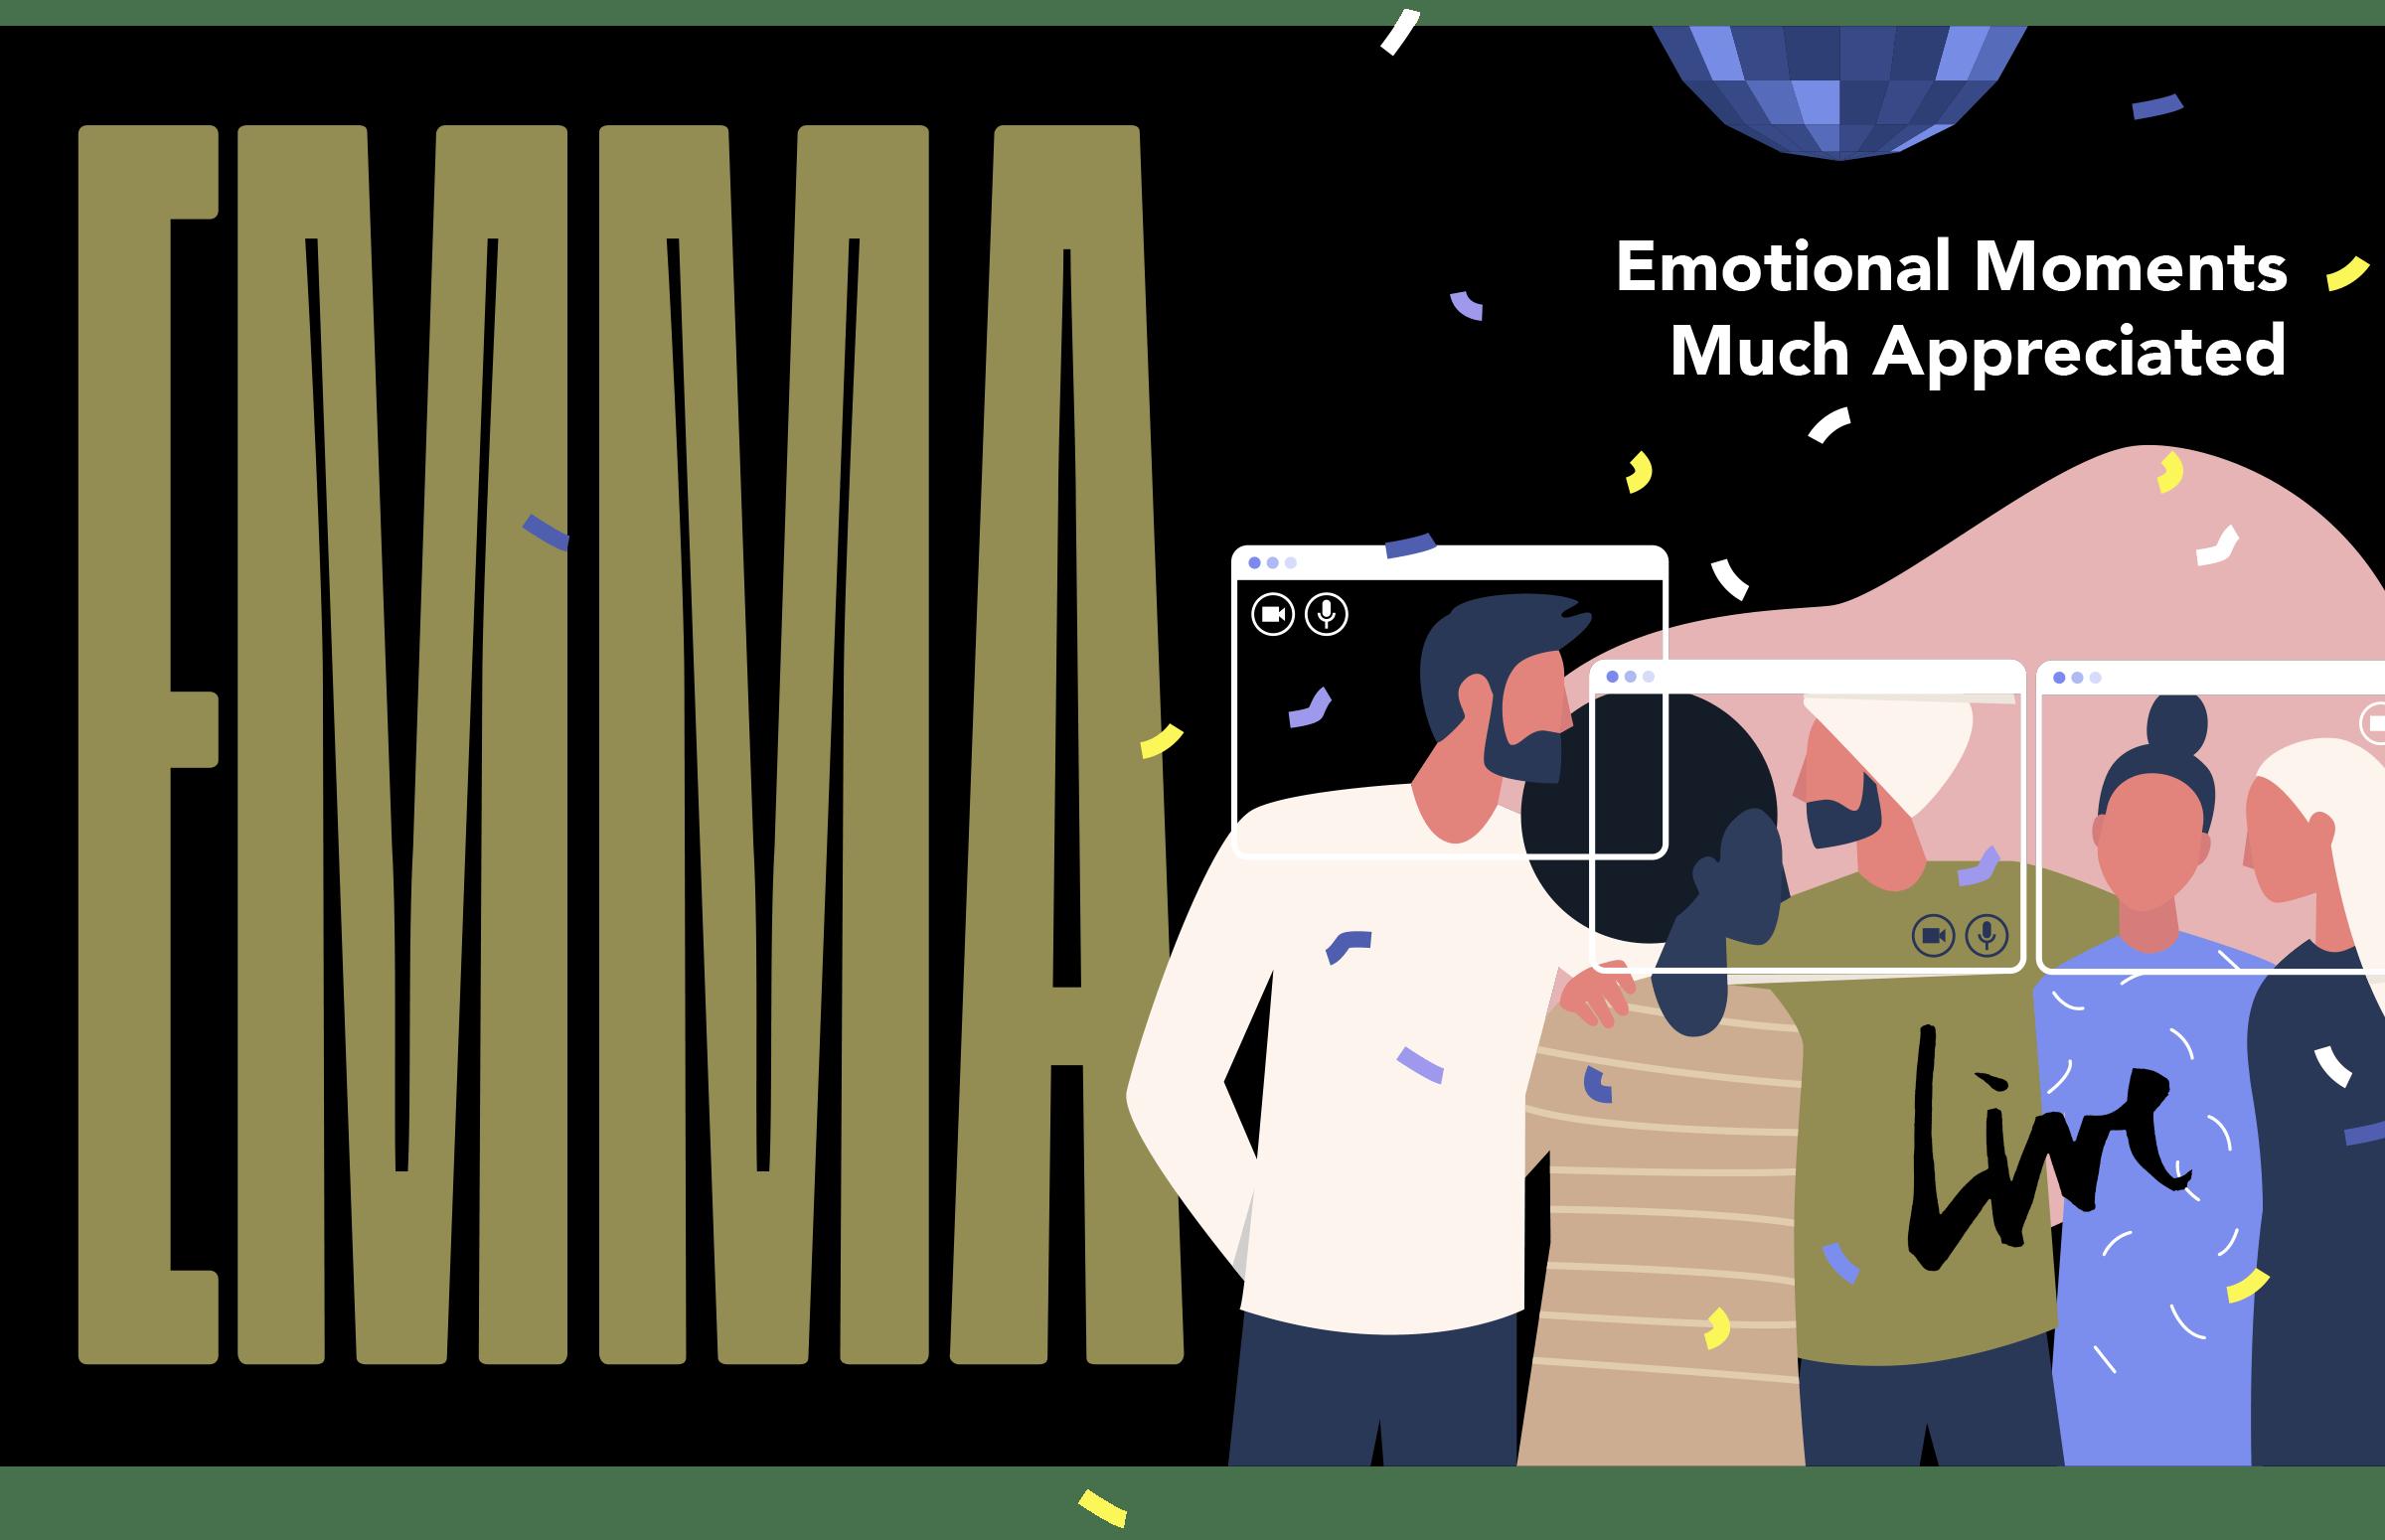 ede-emma-4